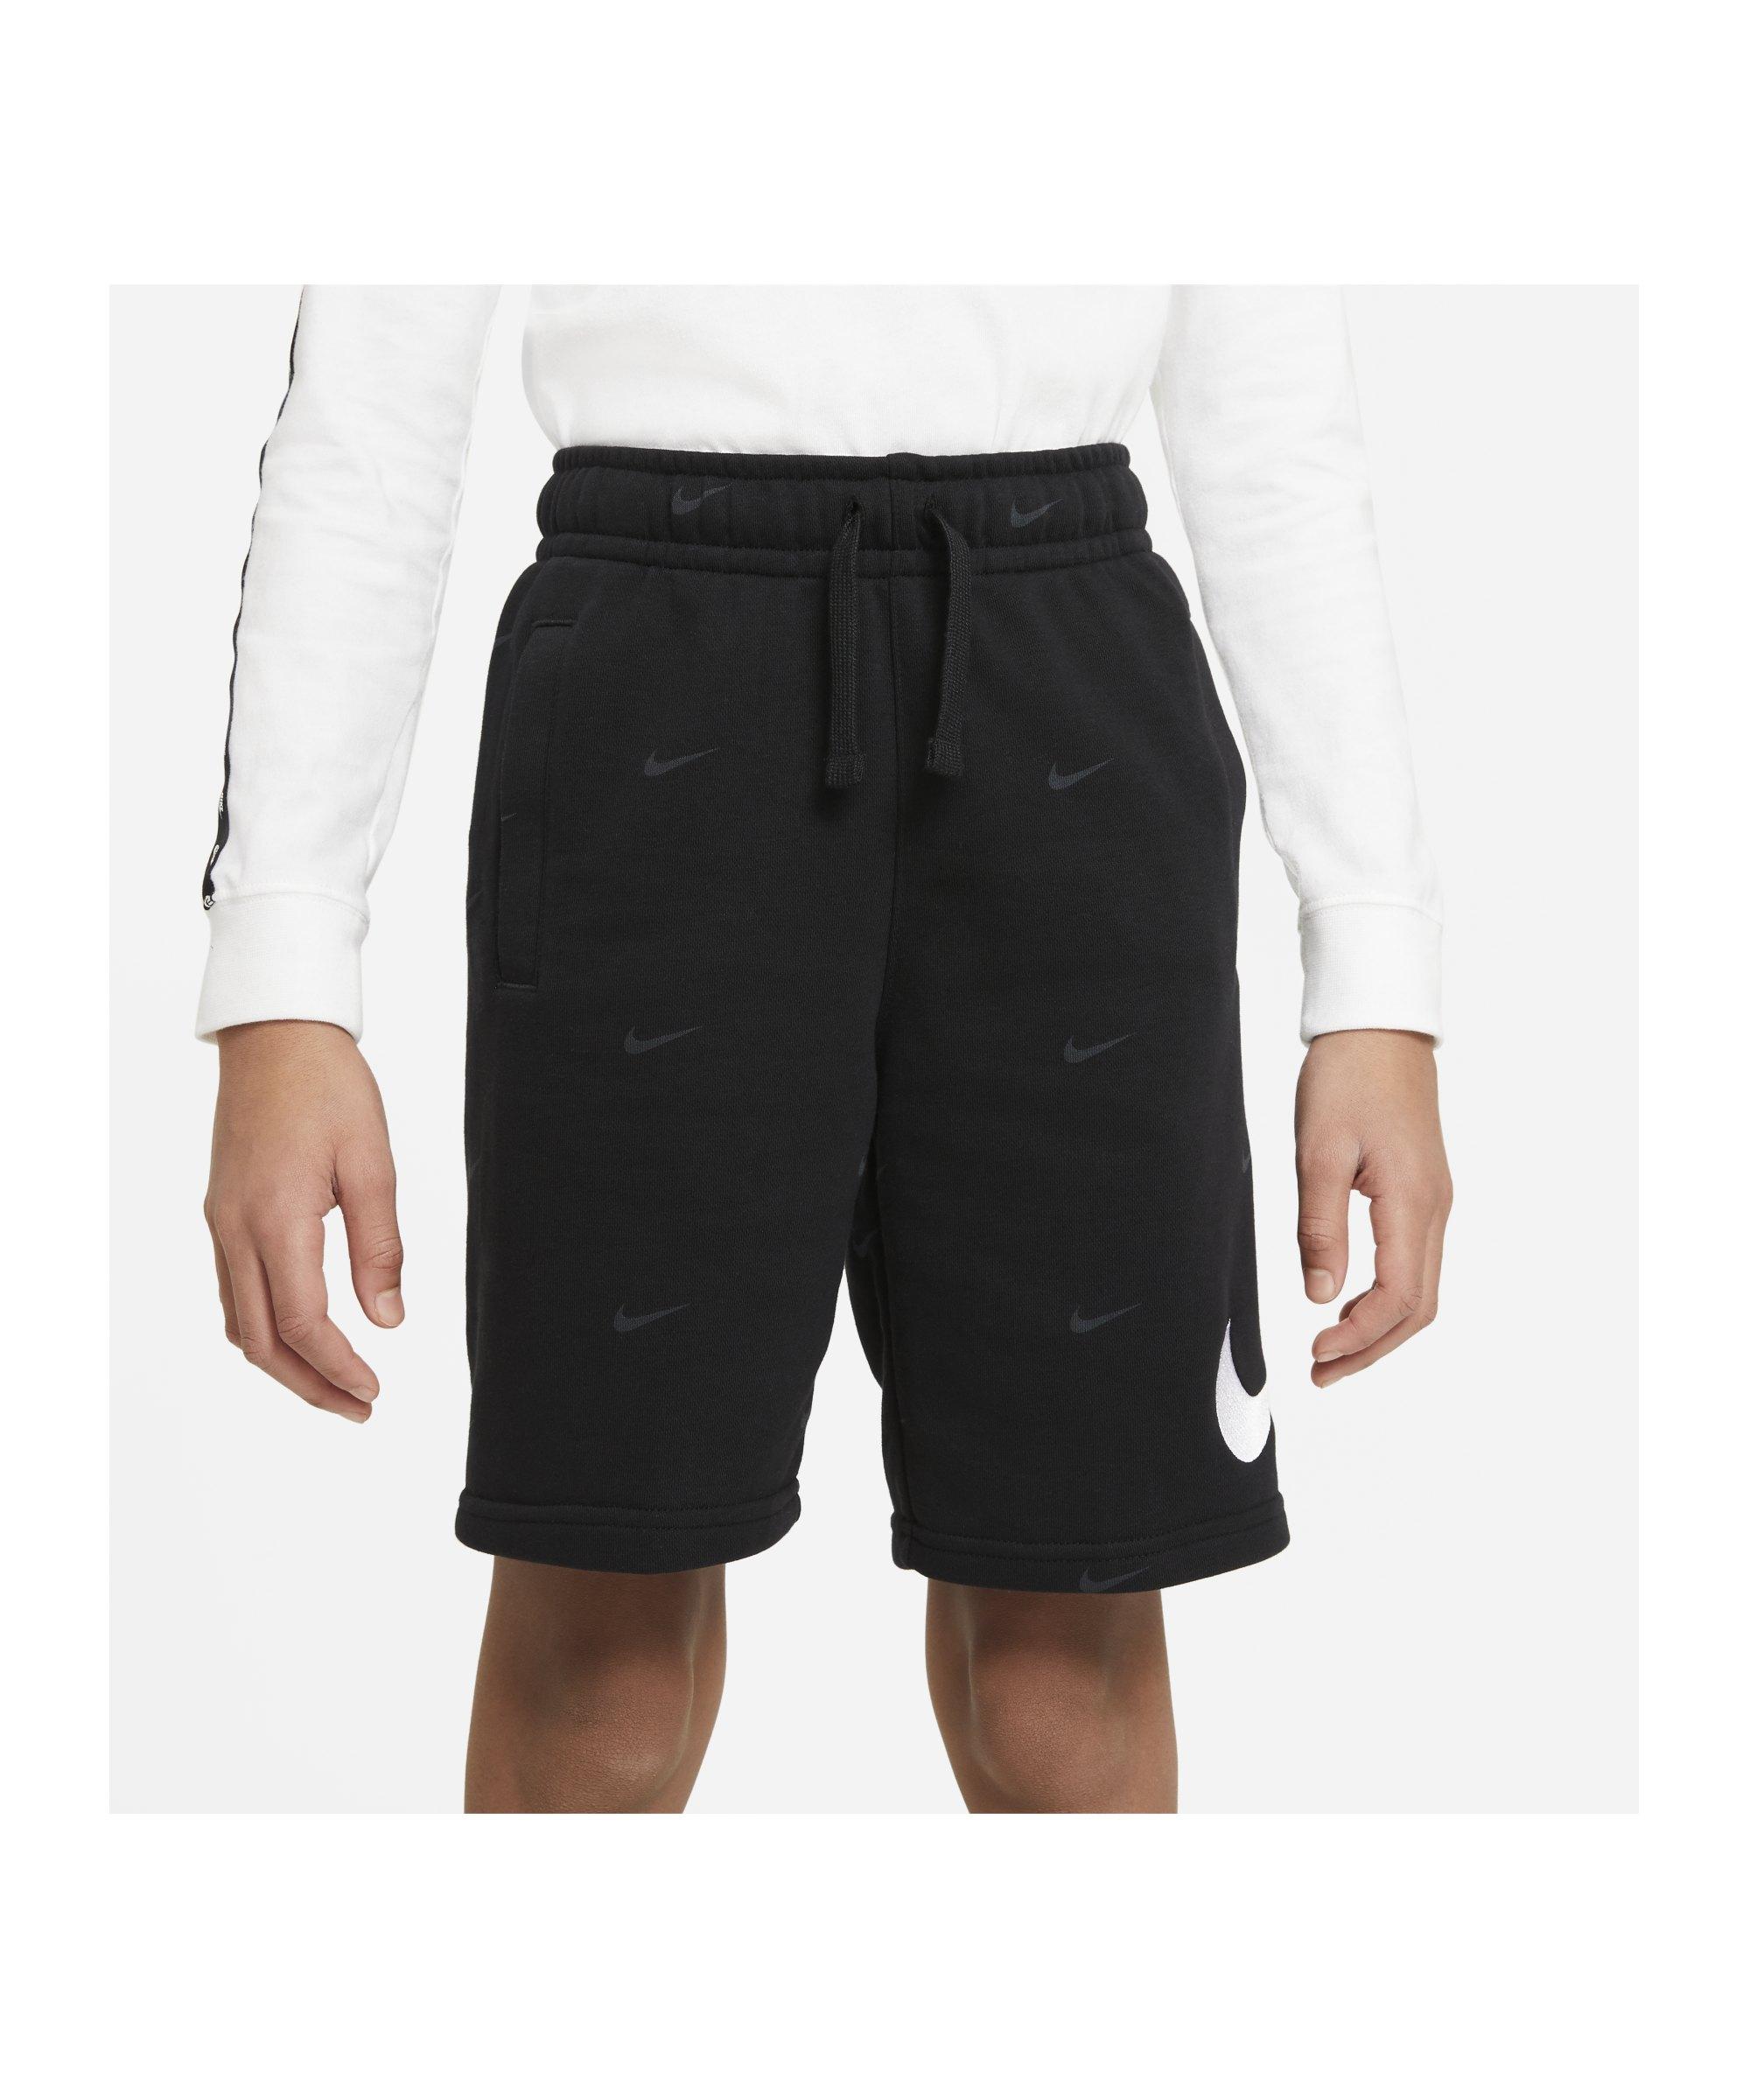 Nike Swoosh Short Kids Schwarz F010 - schwarz